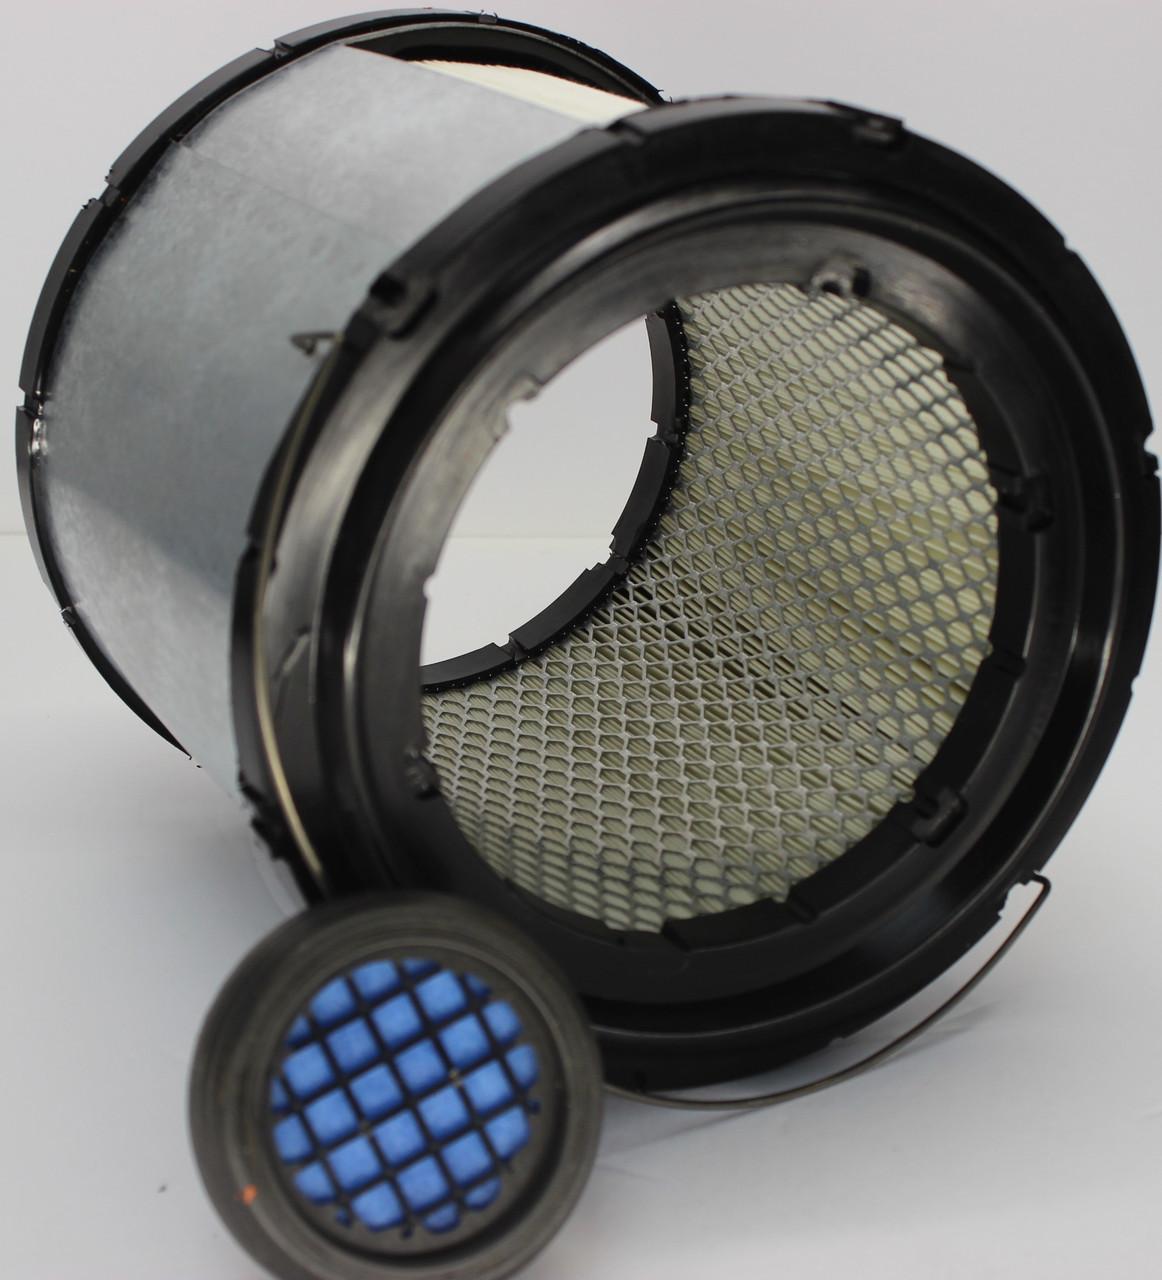 Walker Airsep Coalescer Element Replacement 40-1010 (MPW-19305C)